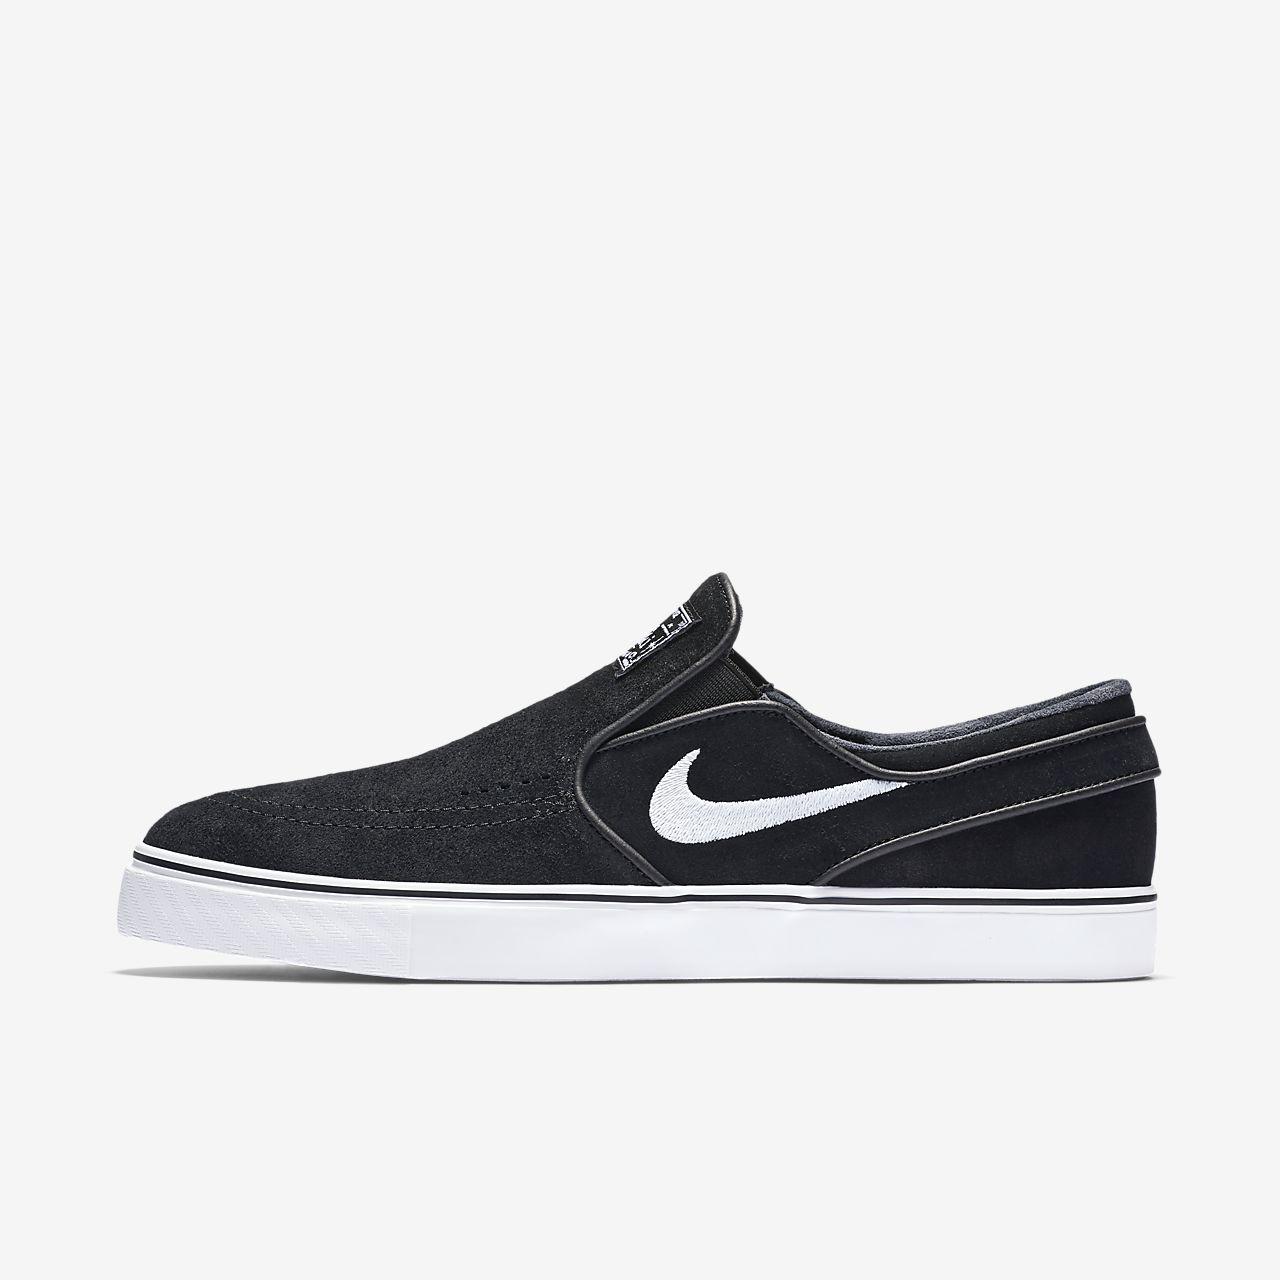 online retailer 09fc4 268df ... Nike SB Zoom Stefan Janoski Slip-On Men s Skateboarding Shoe